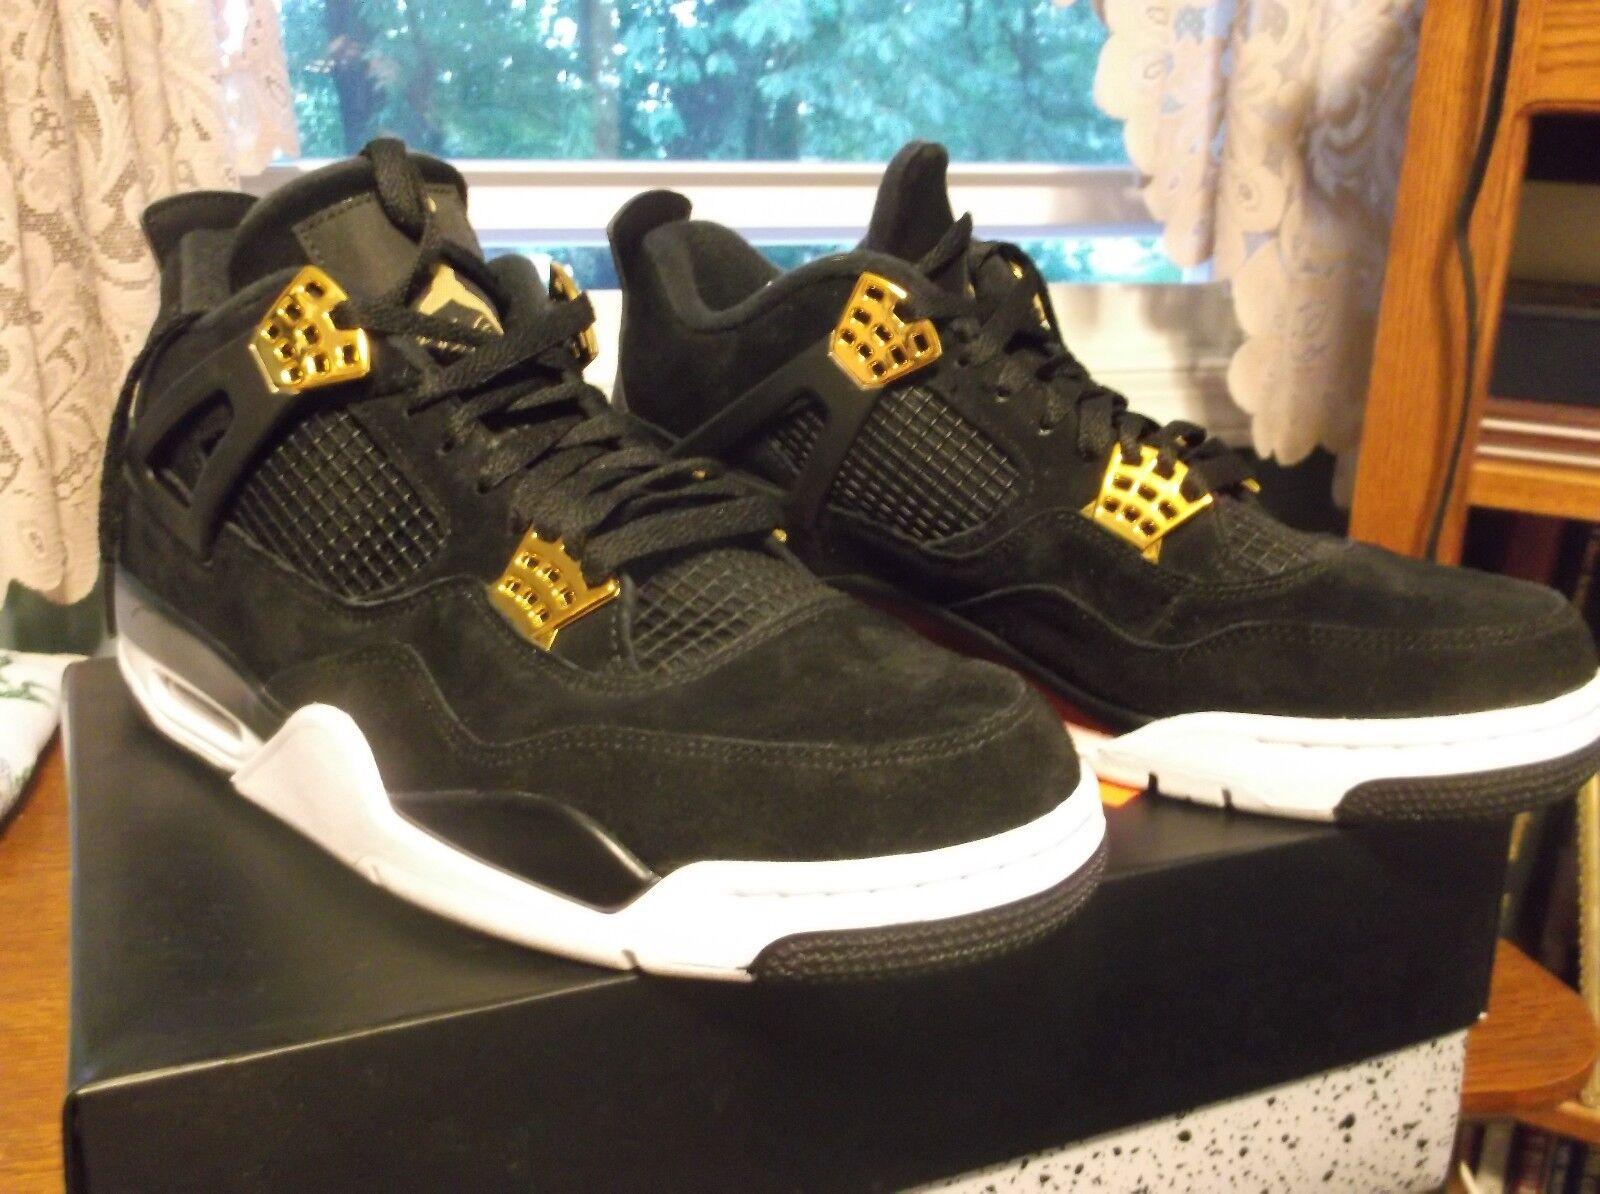 Nike Air Jordan 4 Retro  Royalty Black Gold Mens Sz 10.5